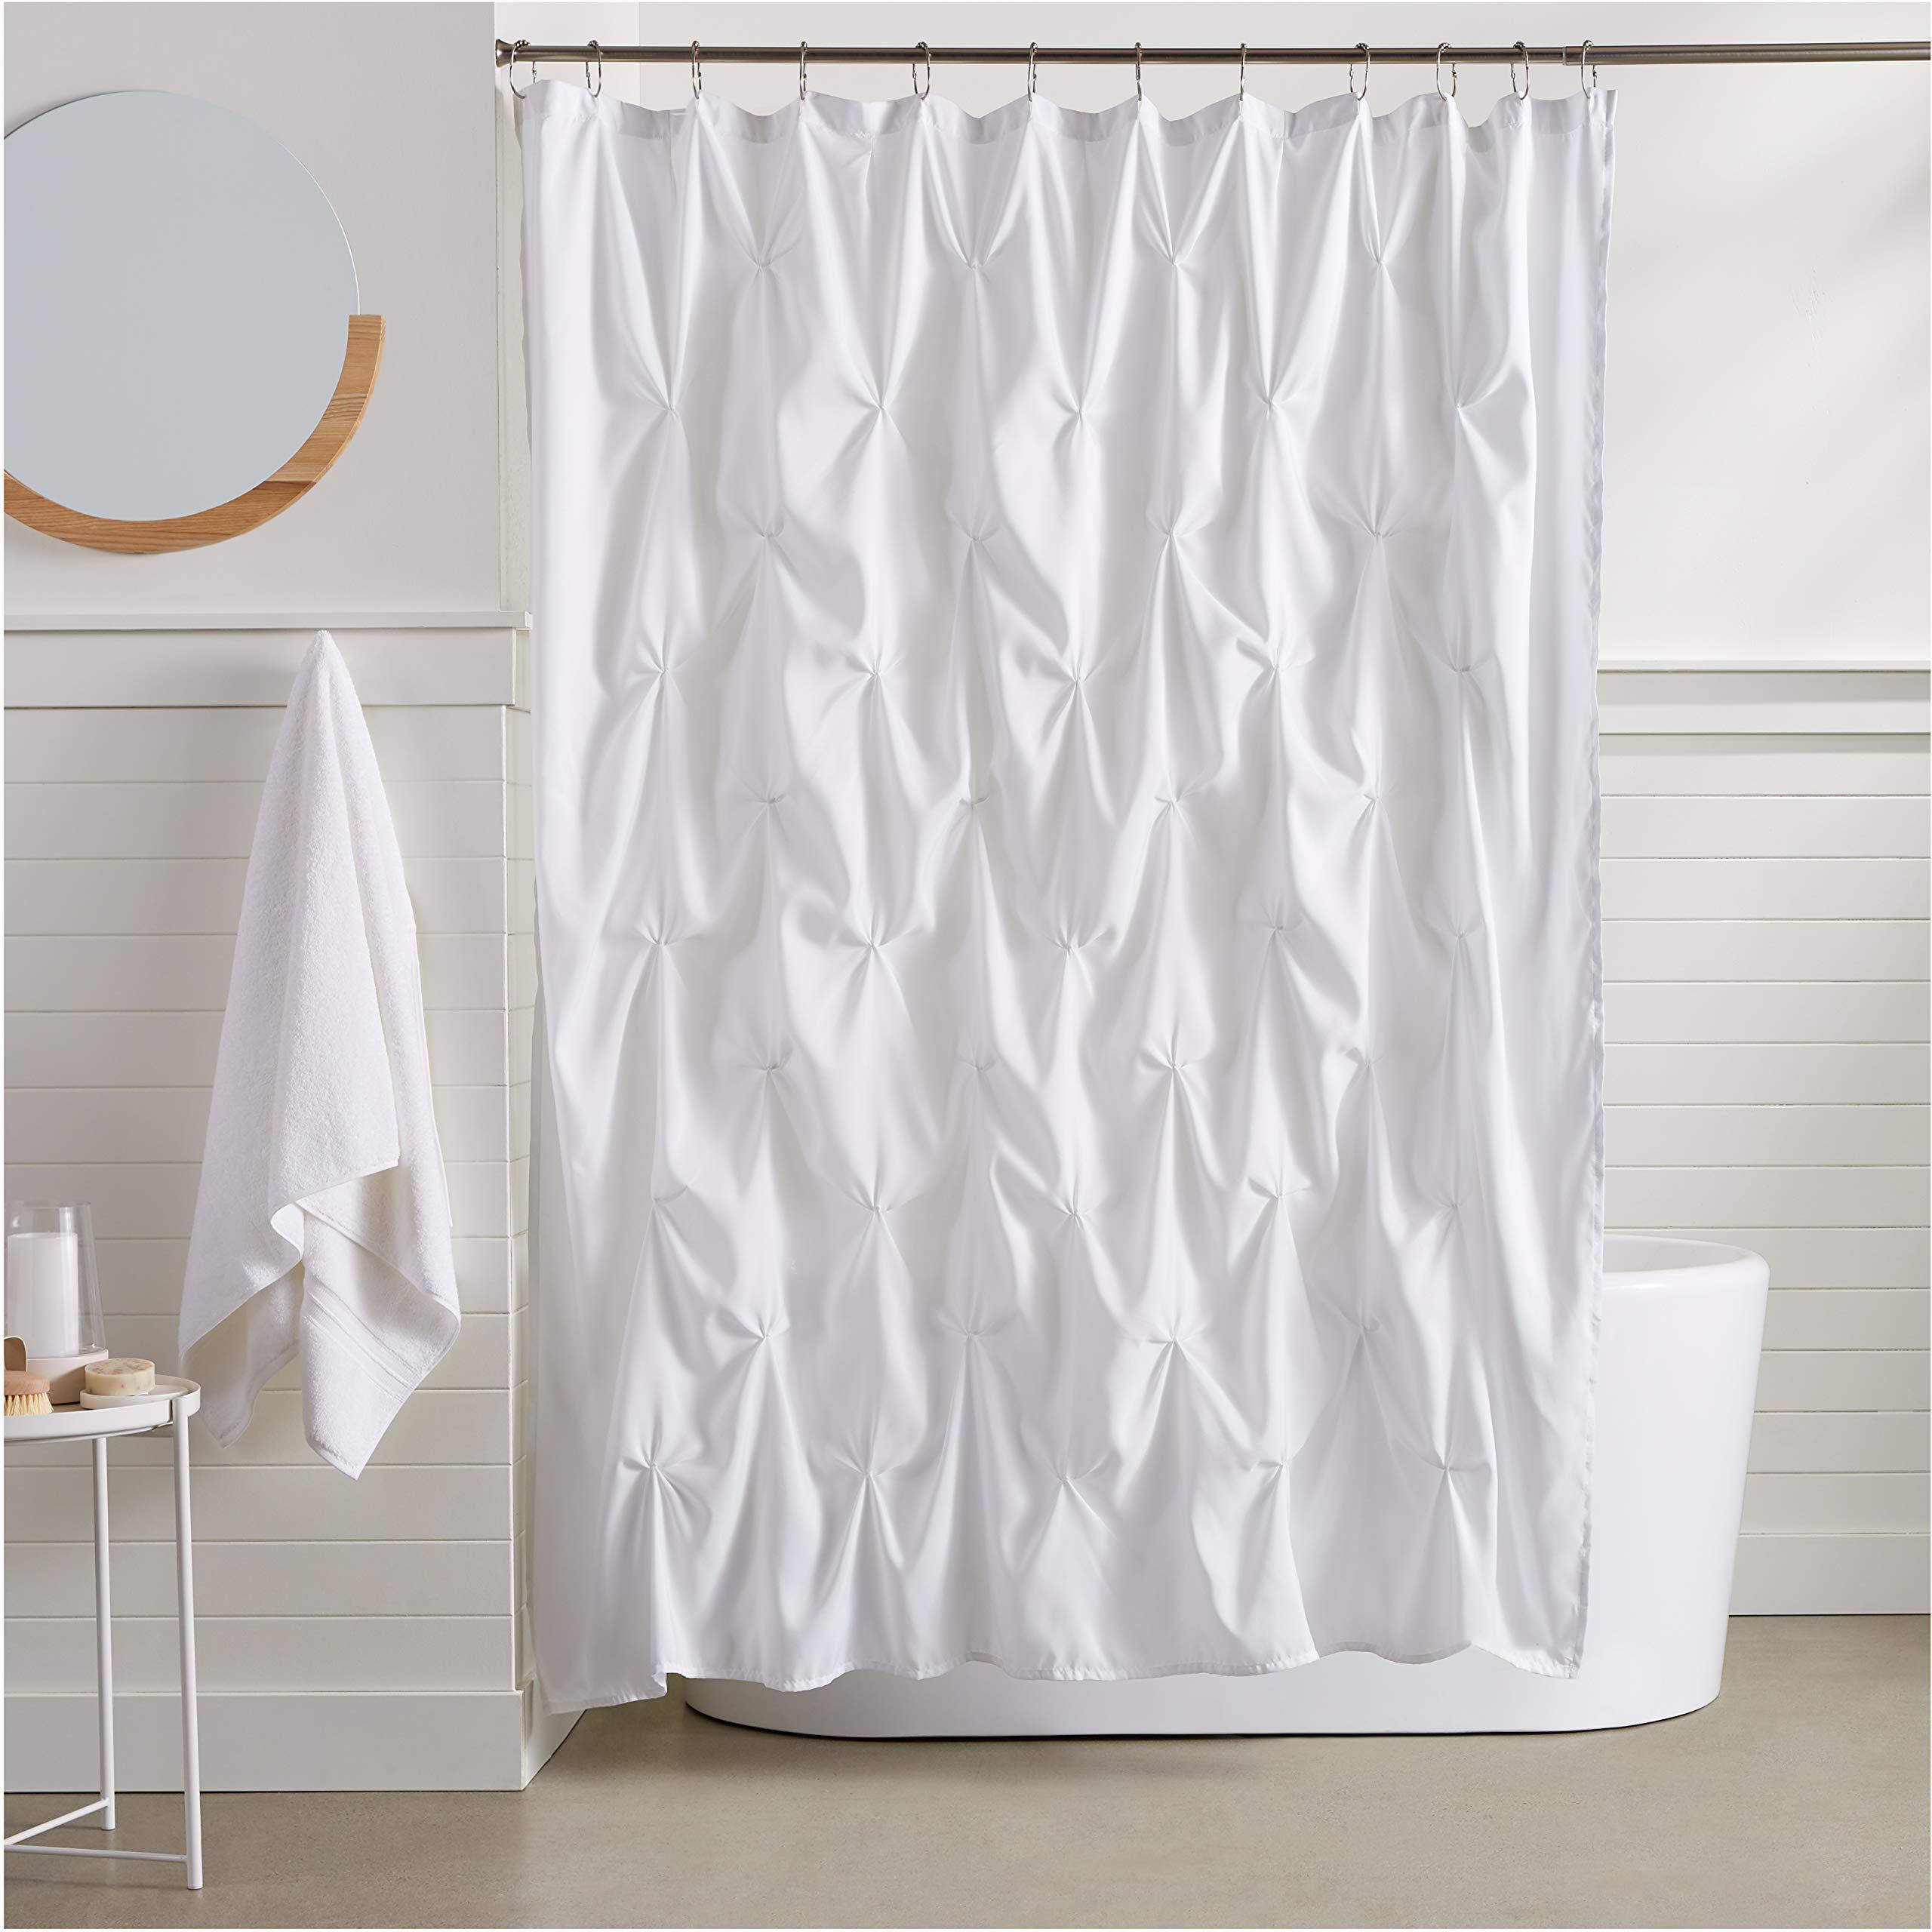 AmazonBasics Pinch Pleat Shower Curtain - 72 Inch, White by AmazonBasics